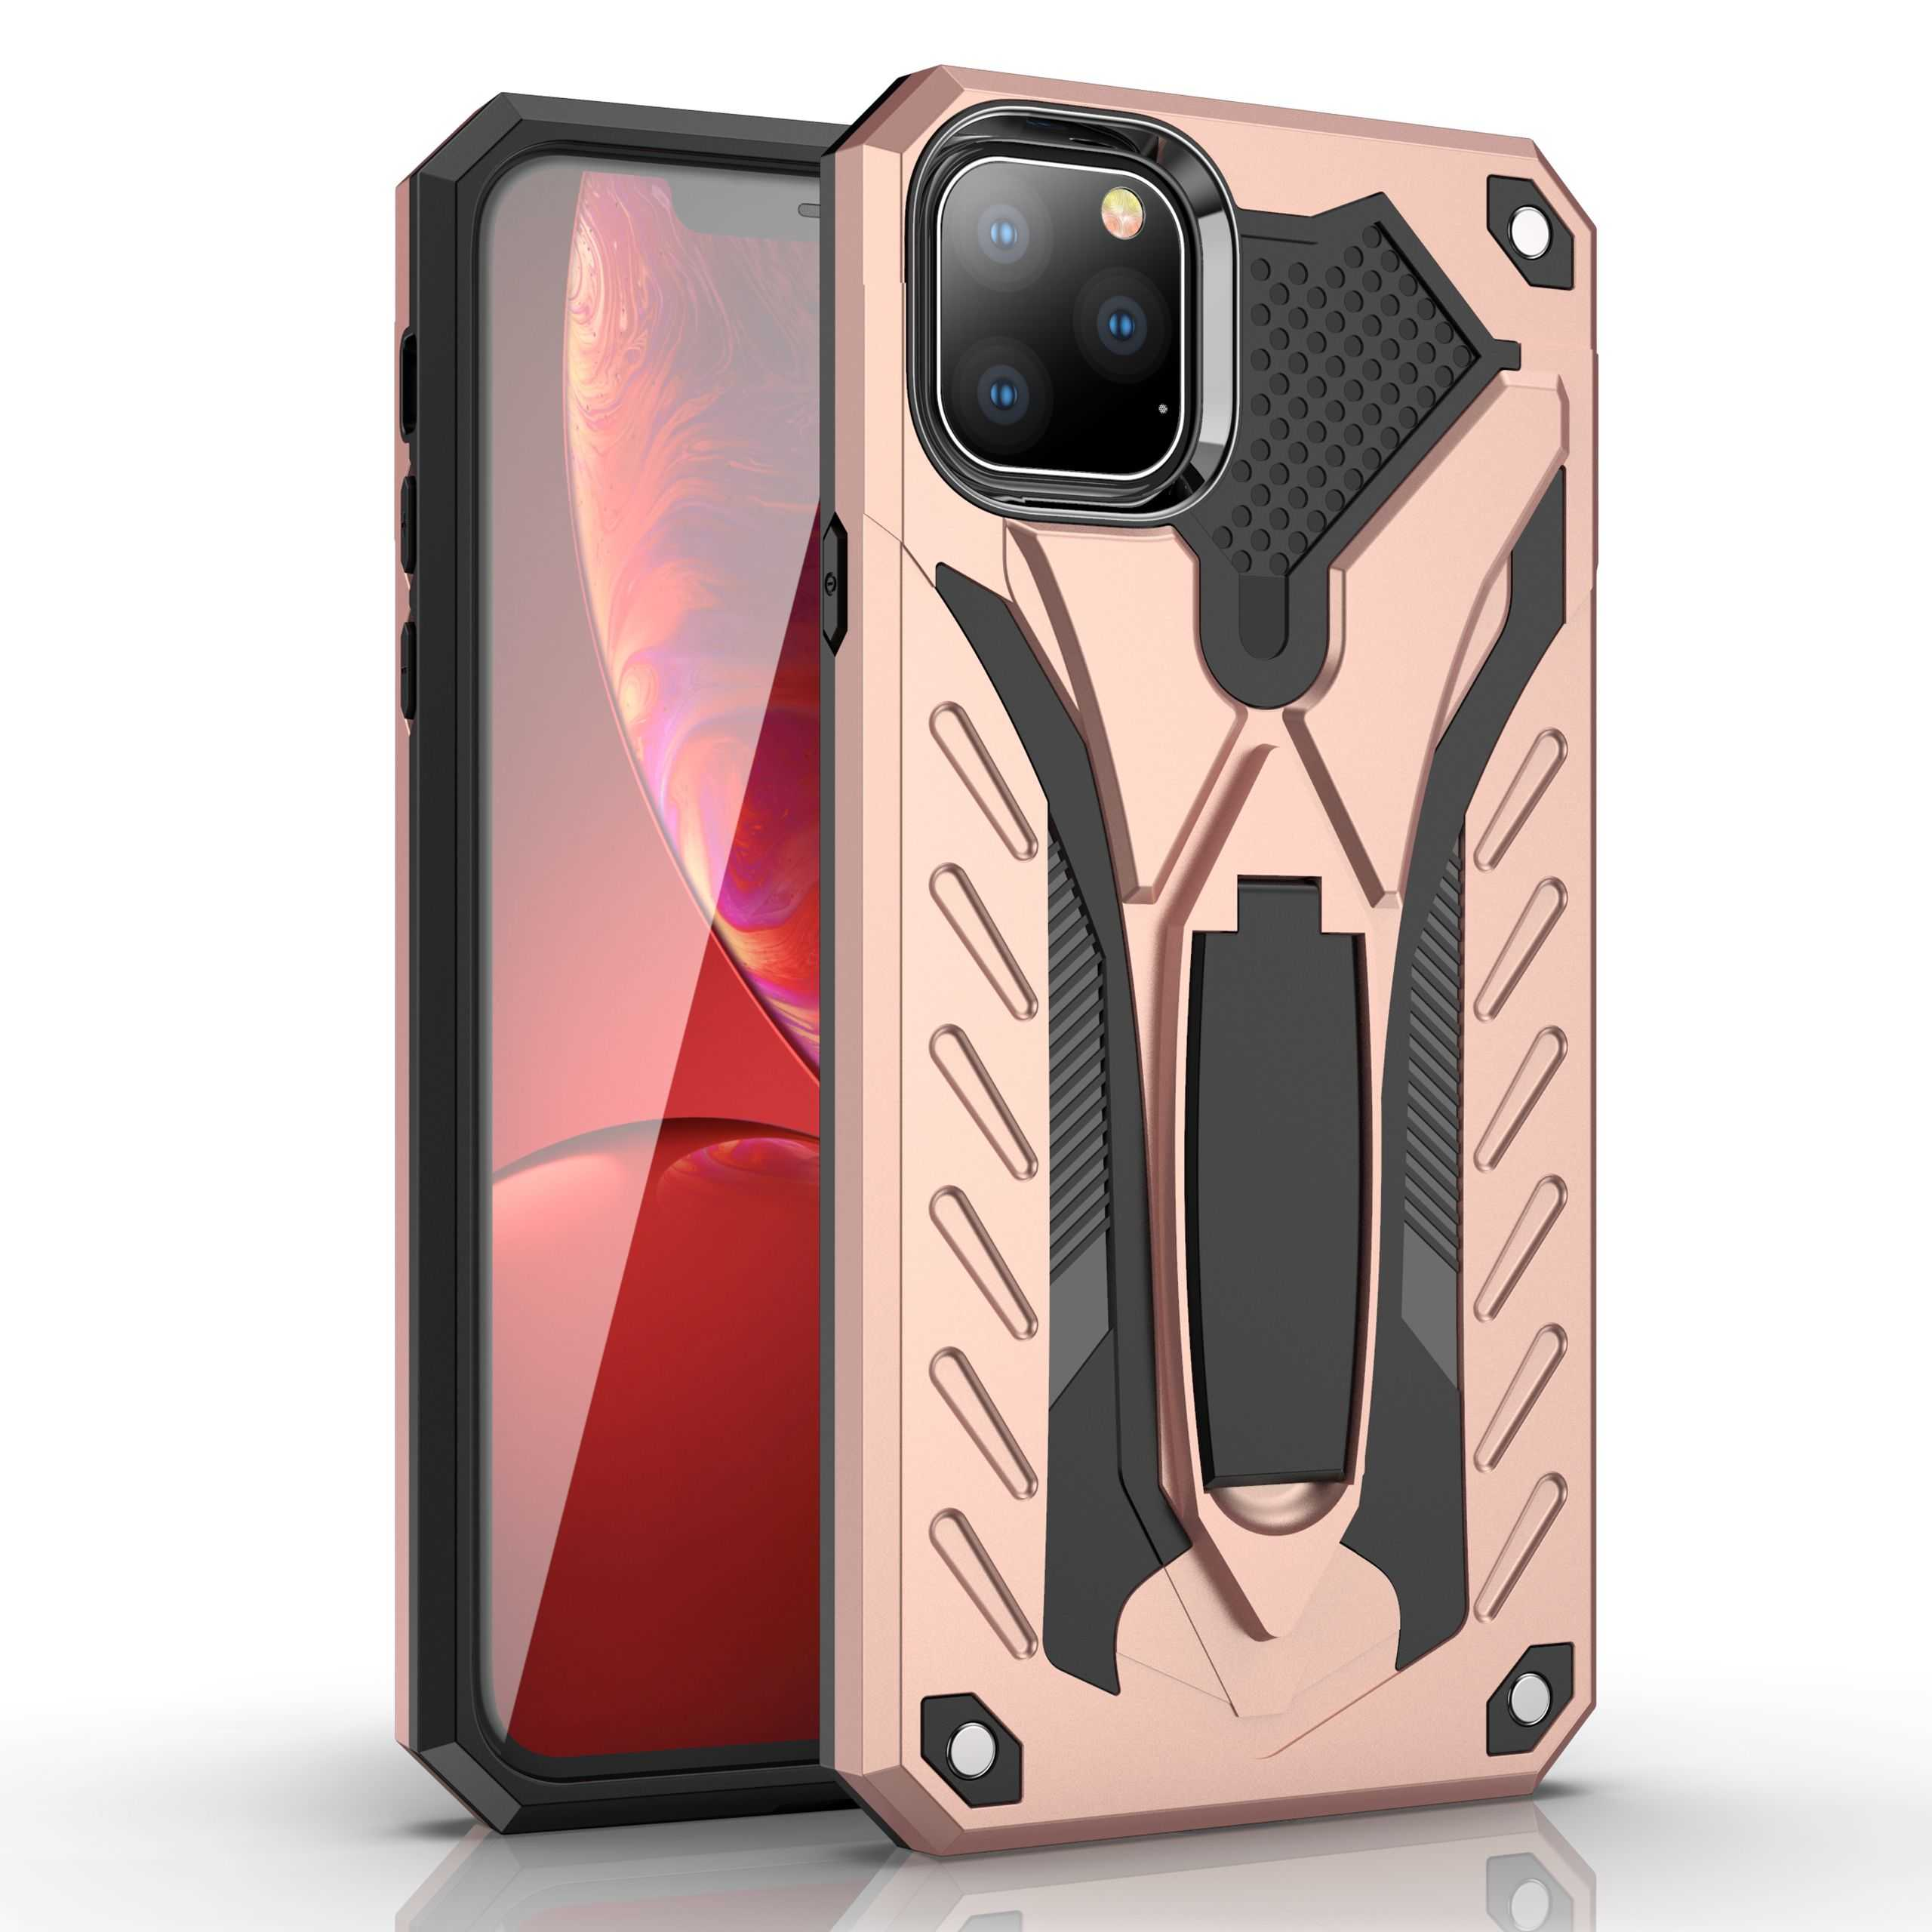 Rugged Armor Case For Motorola Moto G4 G5 E4 E5 C G6 G7 Power Plus Play Hard PC Holder Protective Shockproof phone Case Cover